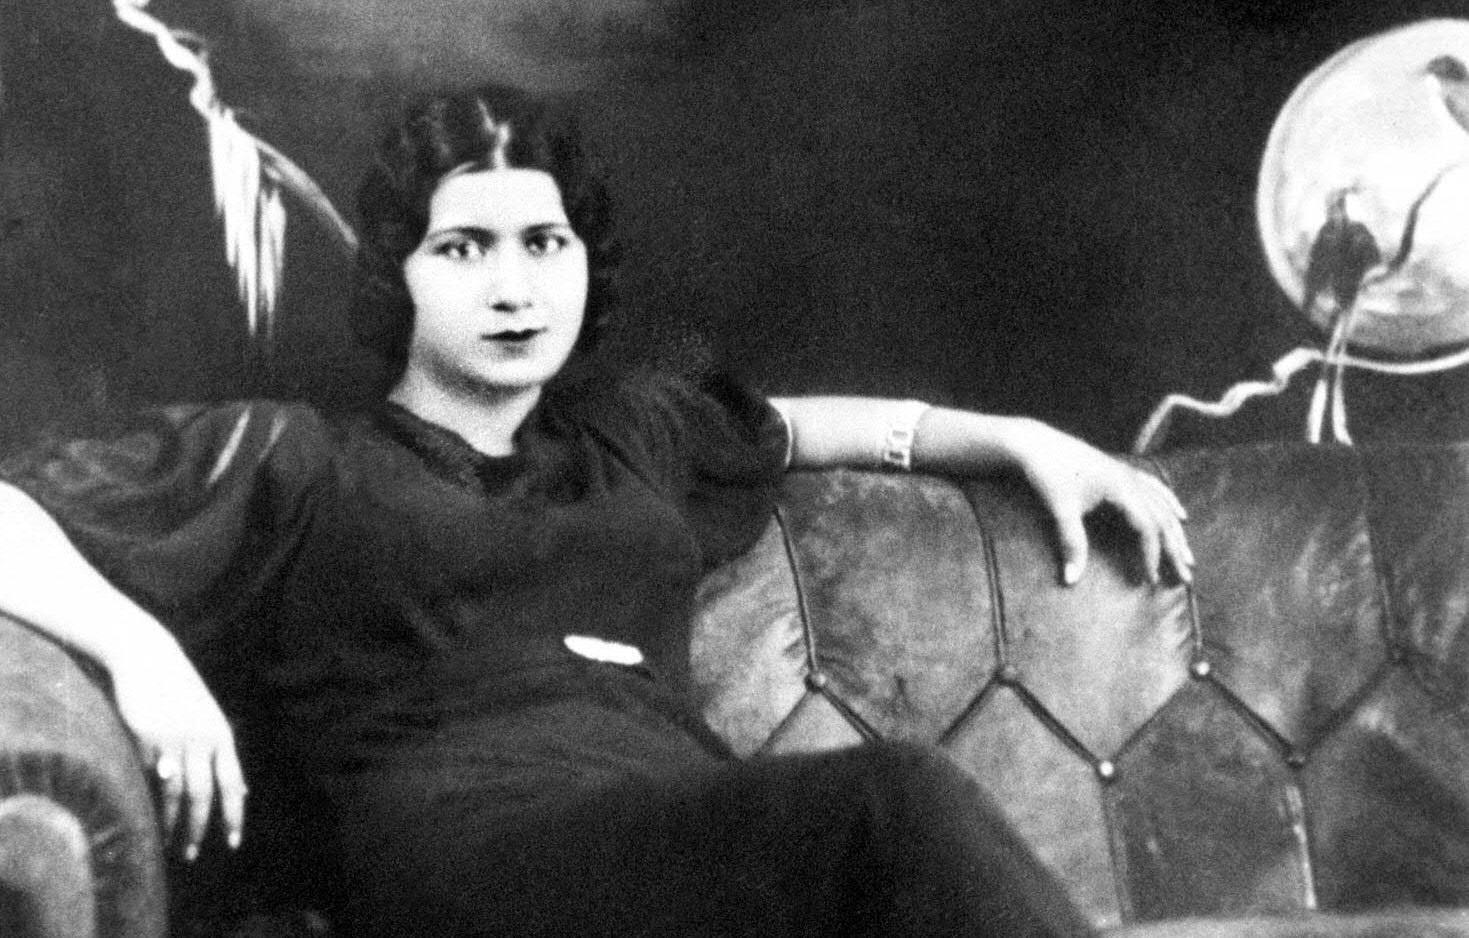 This rare file photo taken in the 1930s shows Egyptian diva Umm Kulthum